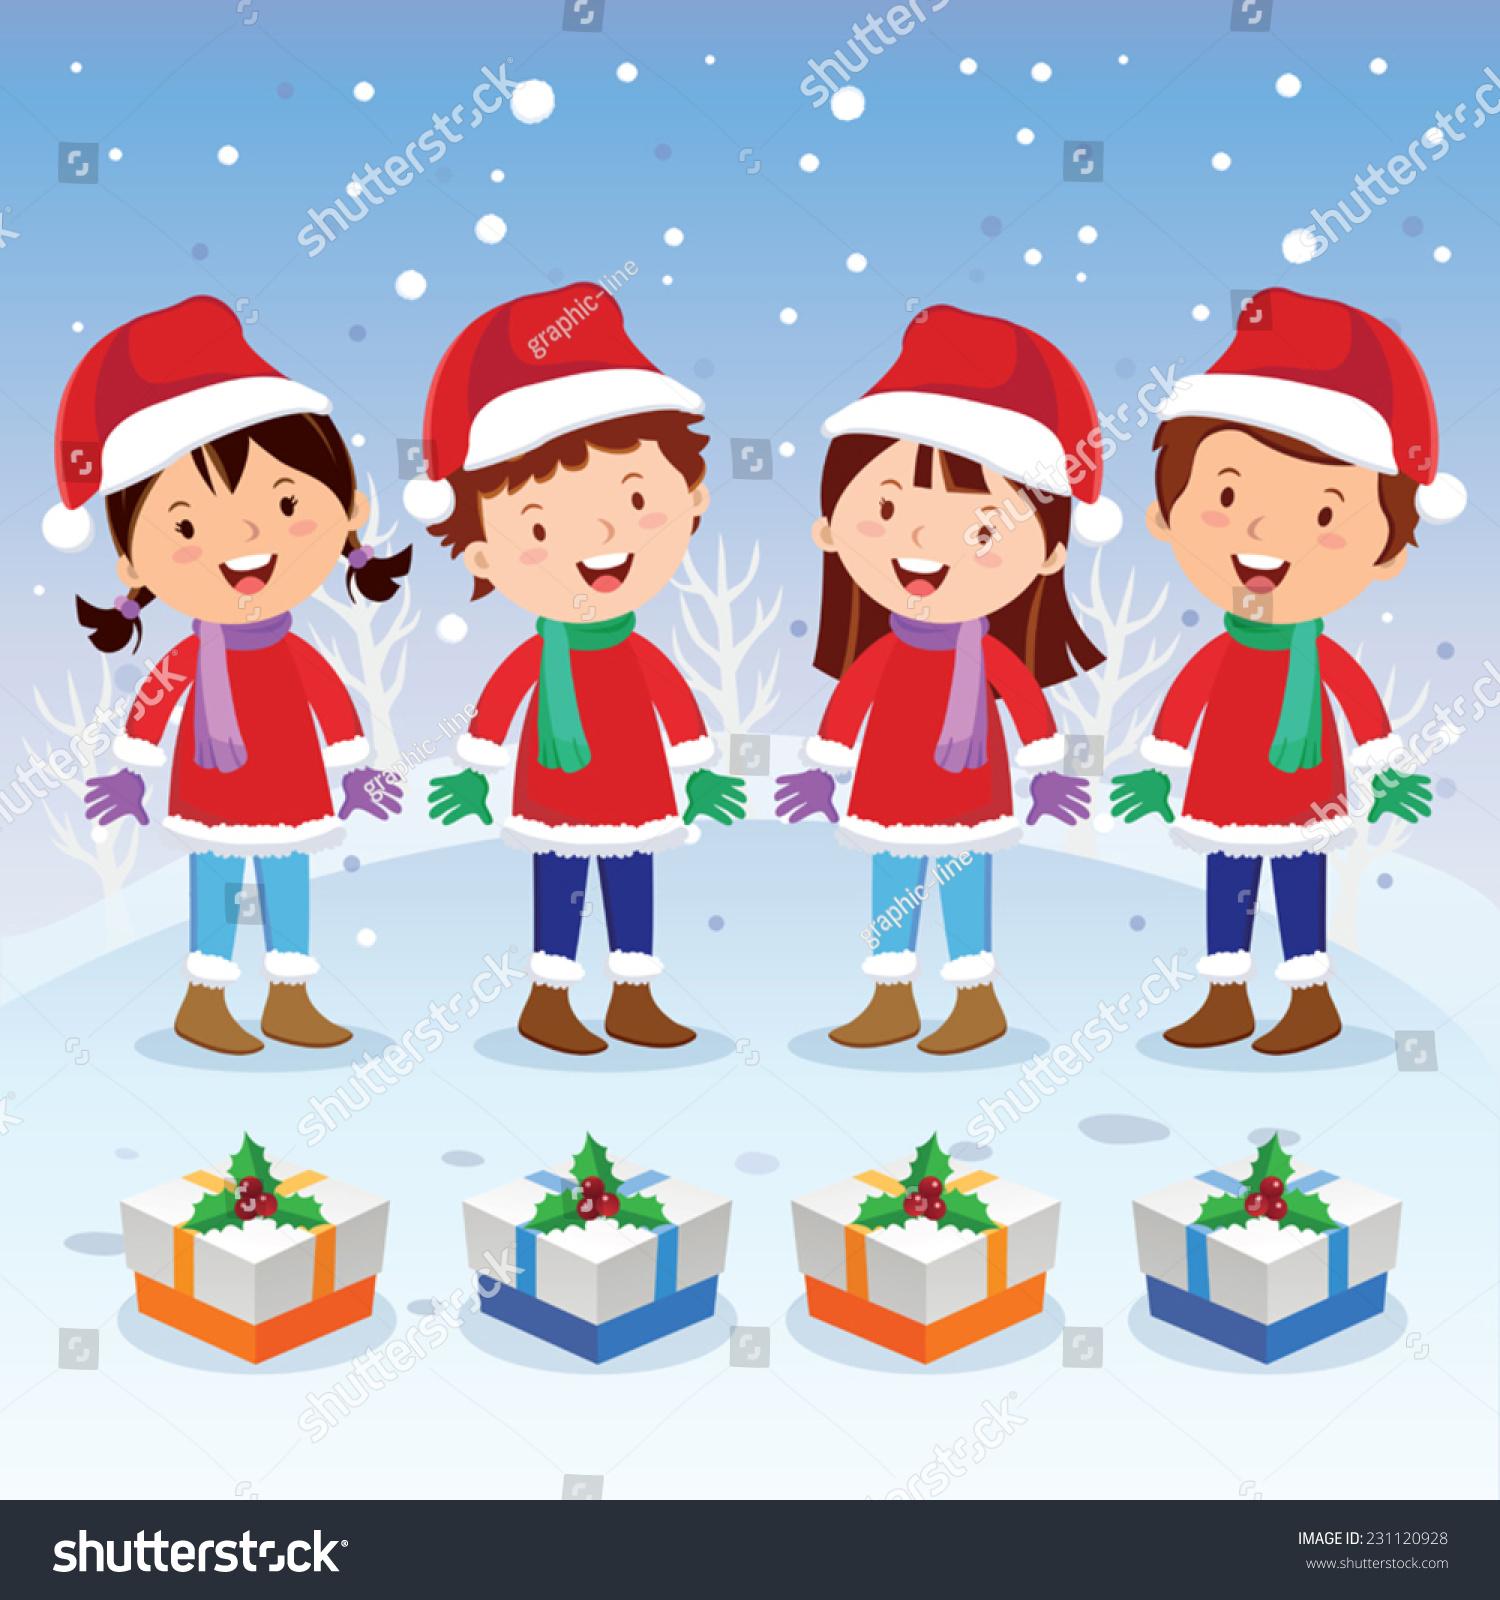 winter fun christmas carols children choir stock vector royalty rh shutterstock com Angel Clip Art Christmas Angels Clip Art